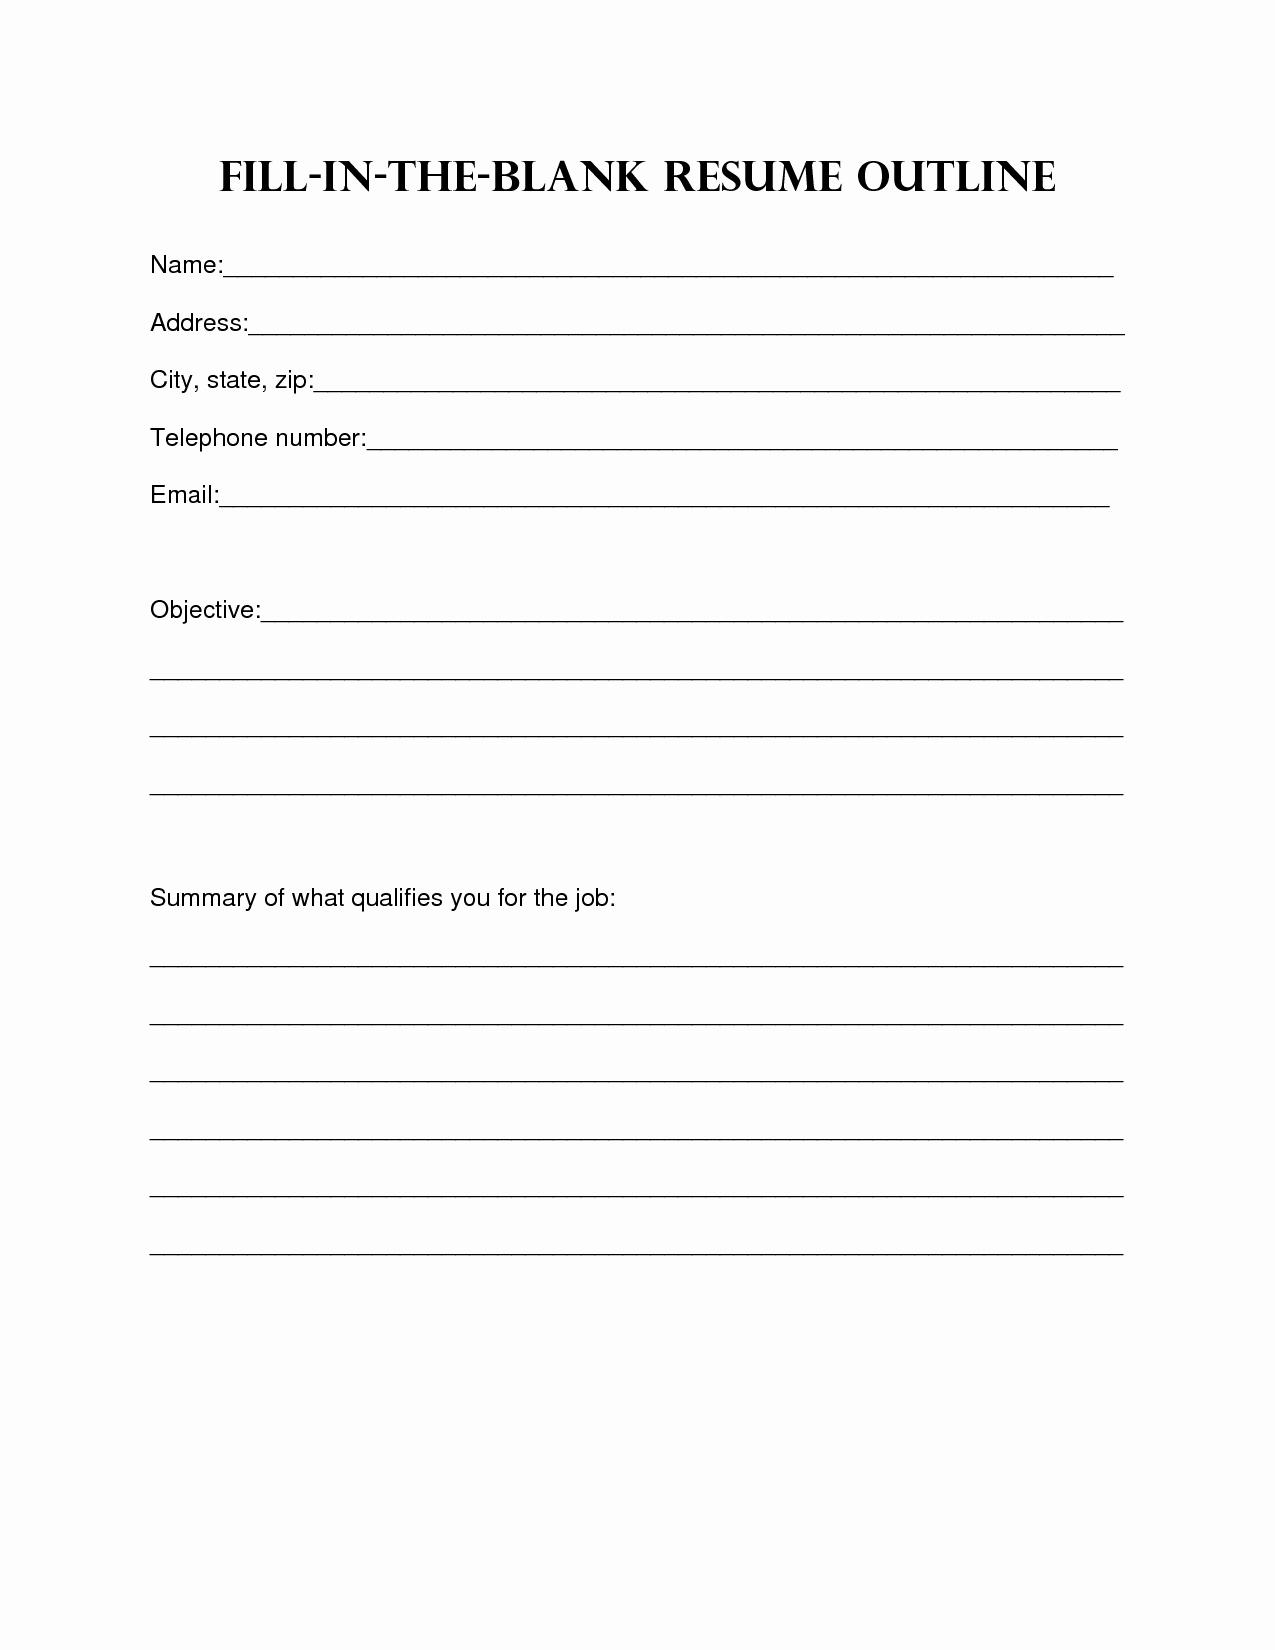 Resumes Fill In the Blanks Elegant 8 Best Of Printable Outline format Blank Essay